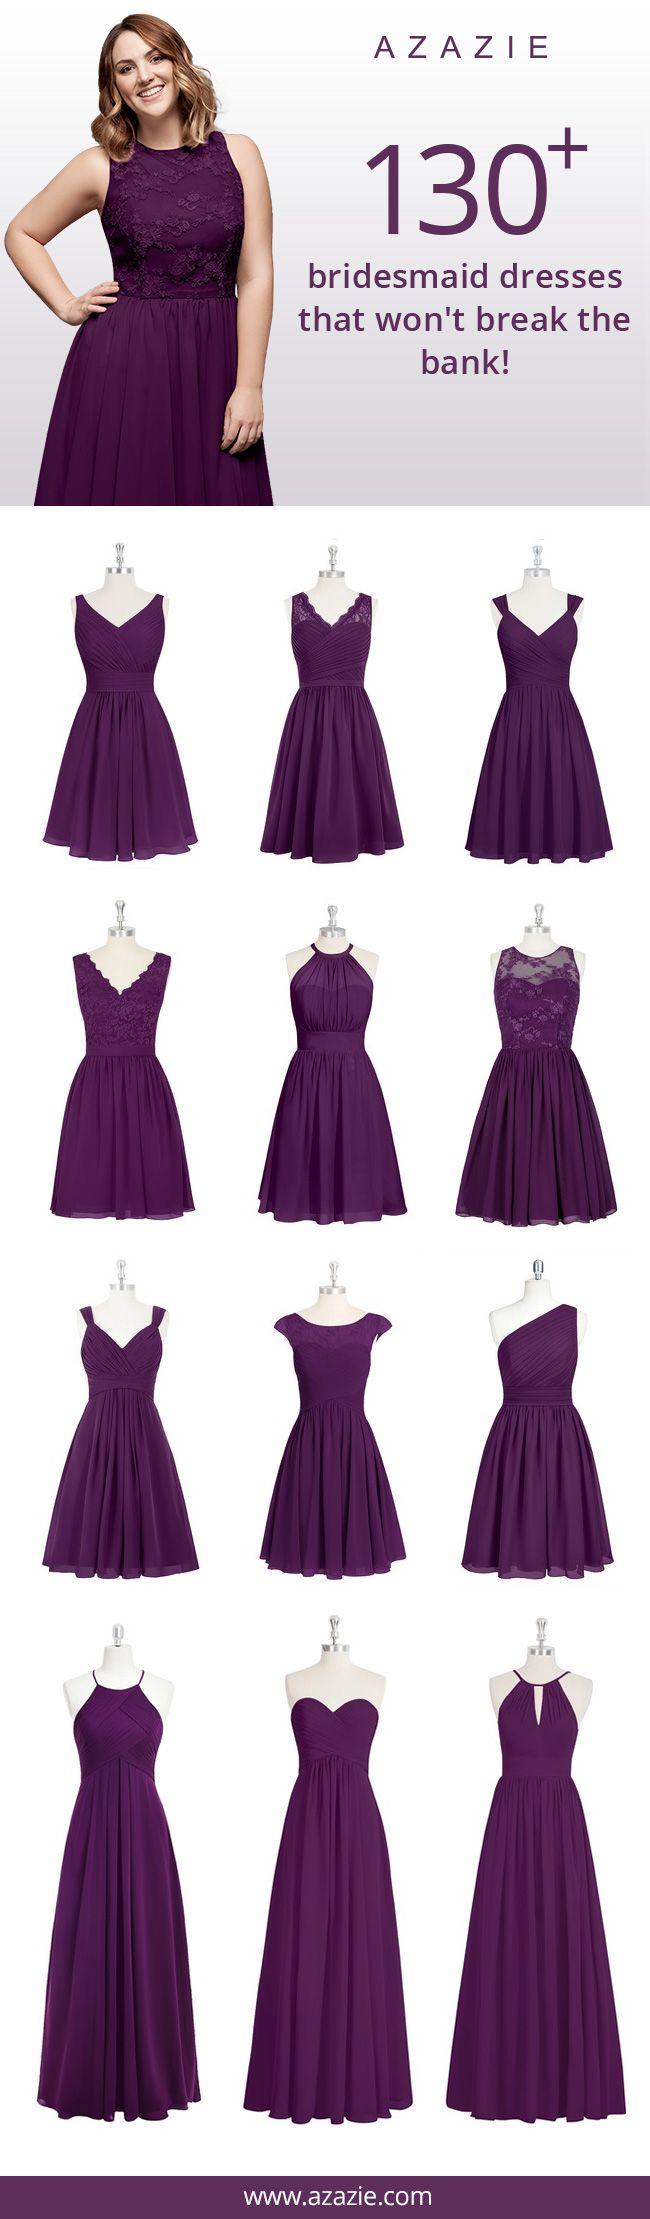 Wedding dresses lakeland fl  cydney kyuanxin on Pinterest